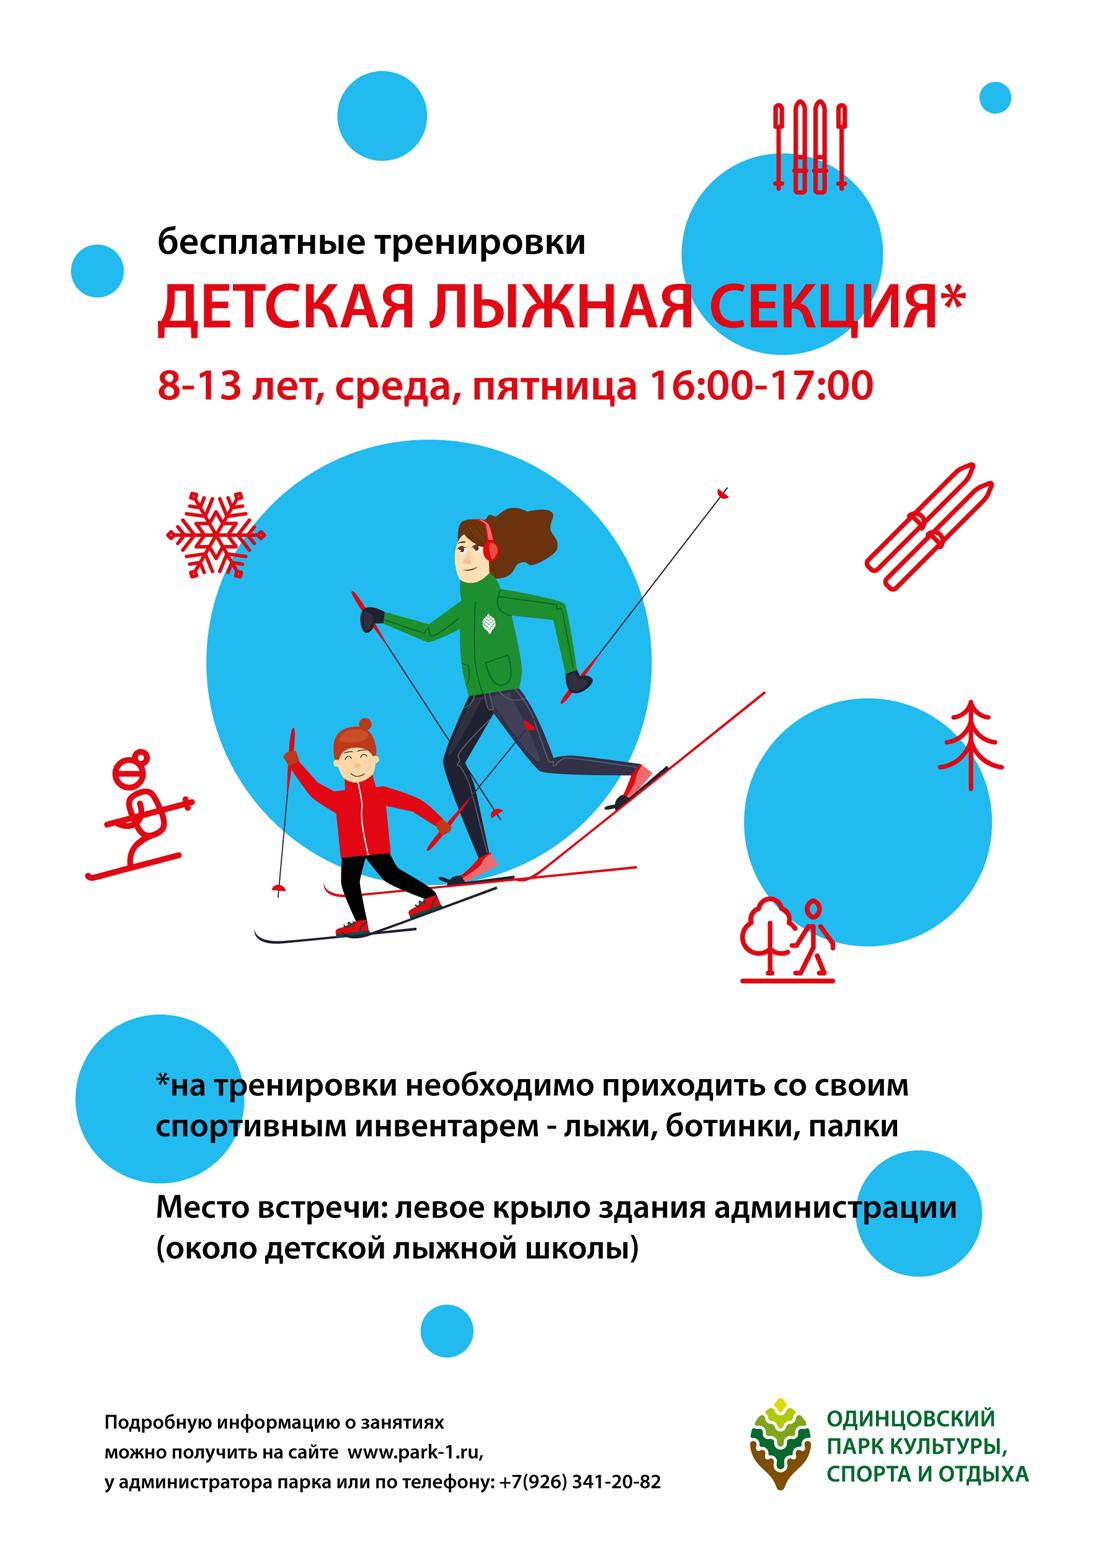 Plakat børneskiskole sektion